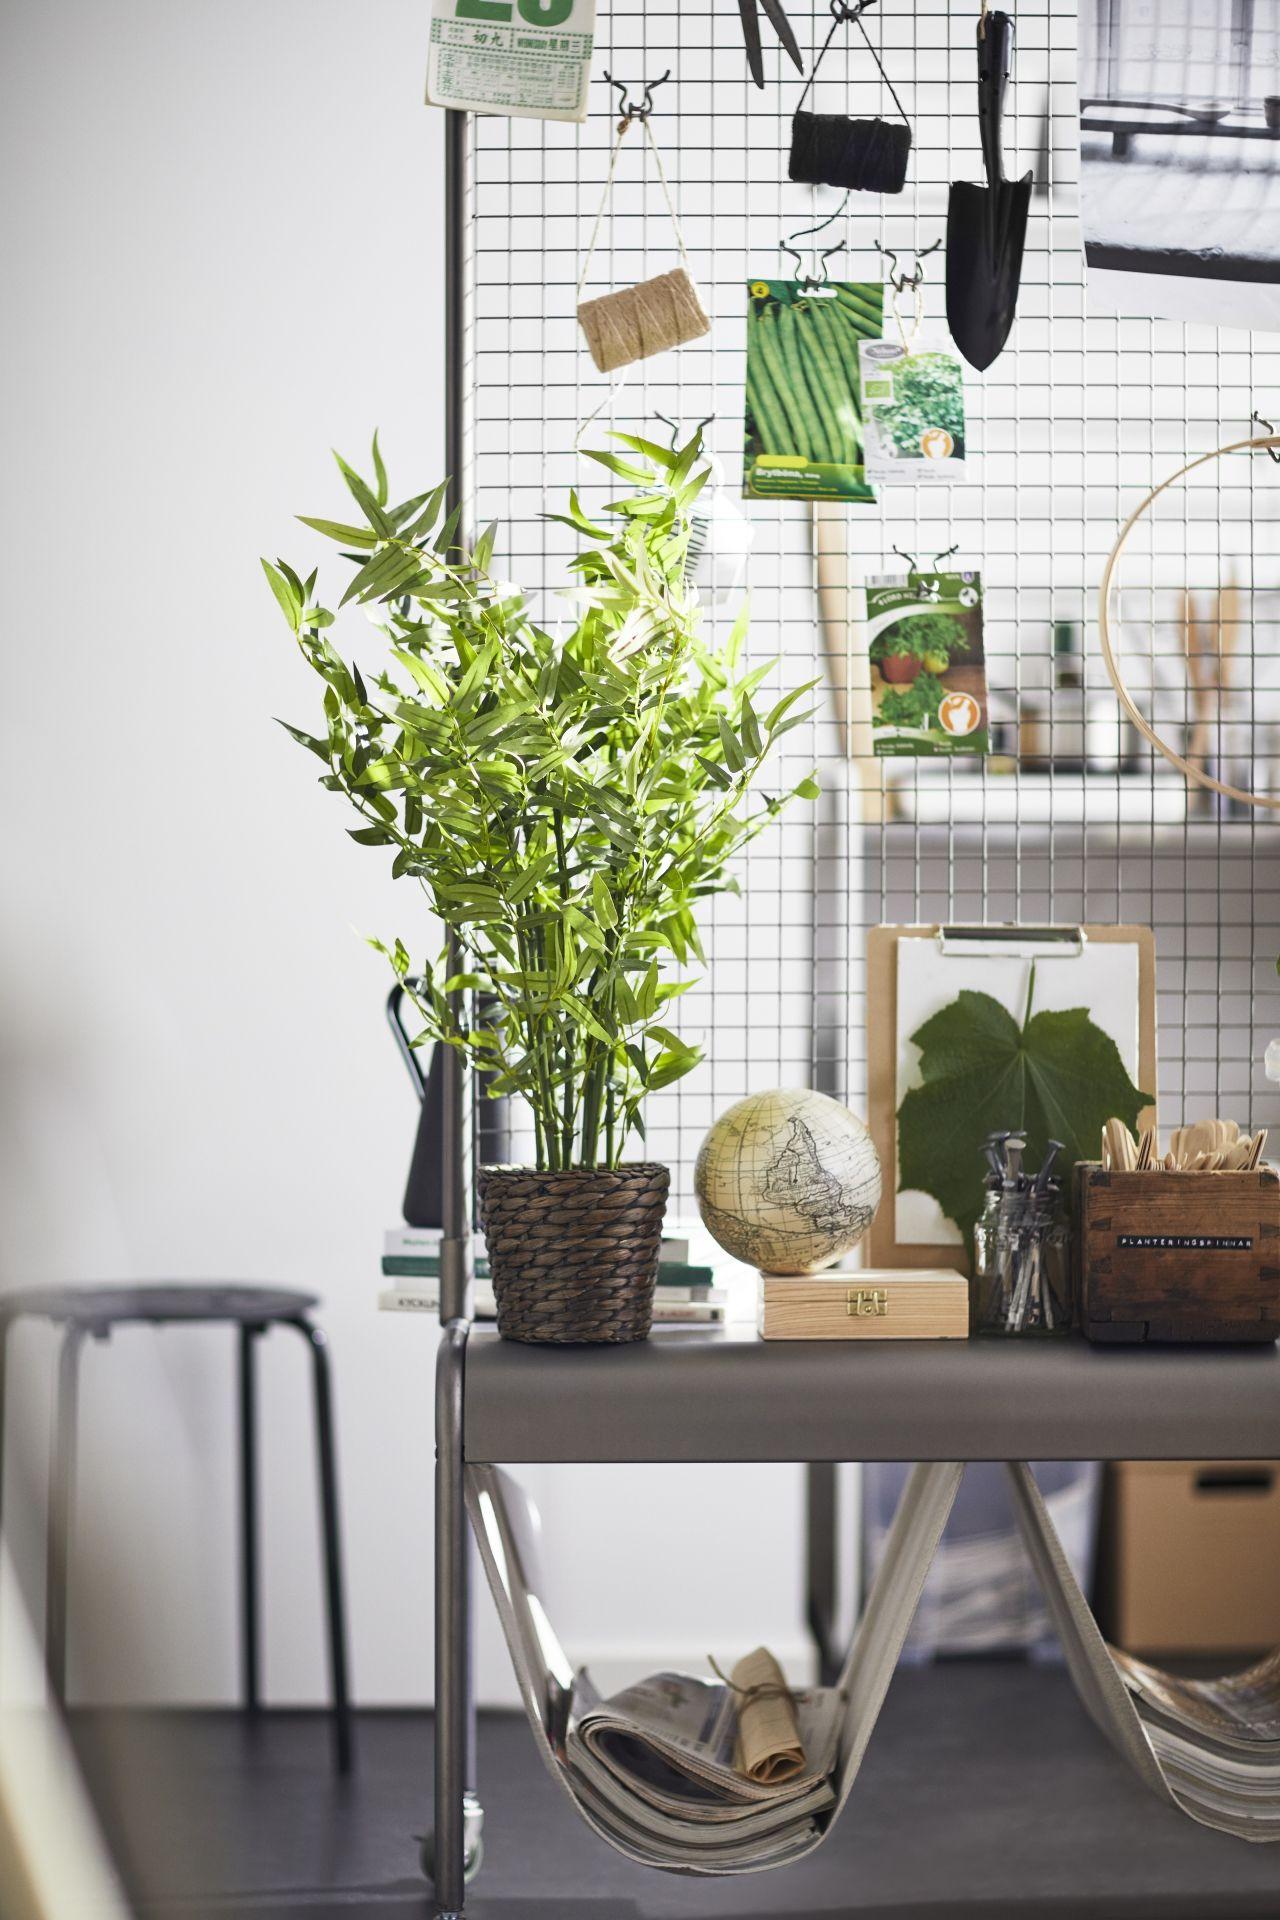 Veber D Scheidingswand - Ikeacatalogus Nieuw 2018 Ikea Ikeanl Ikeanederland